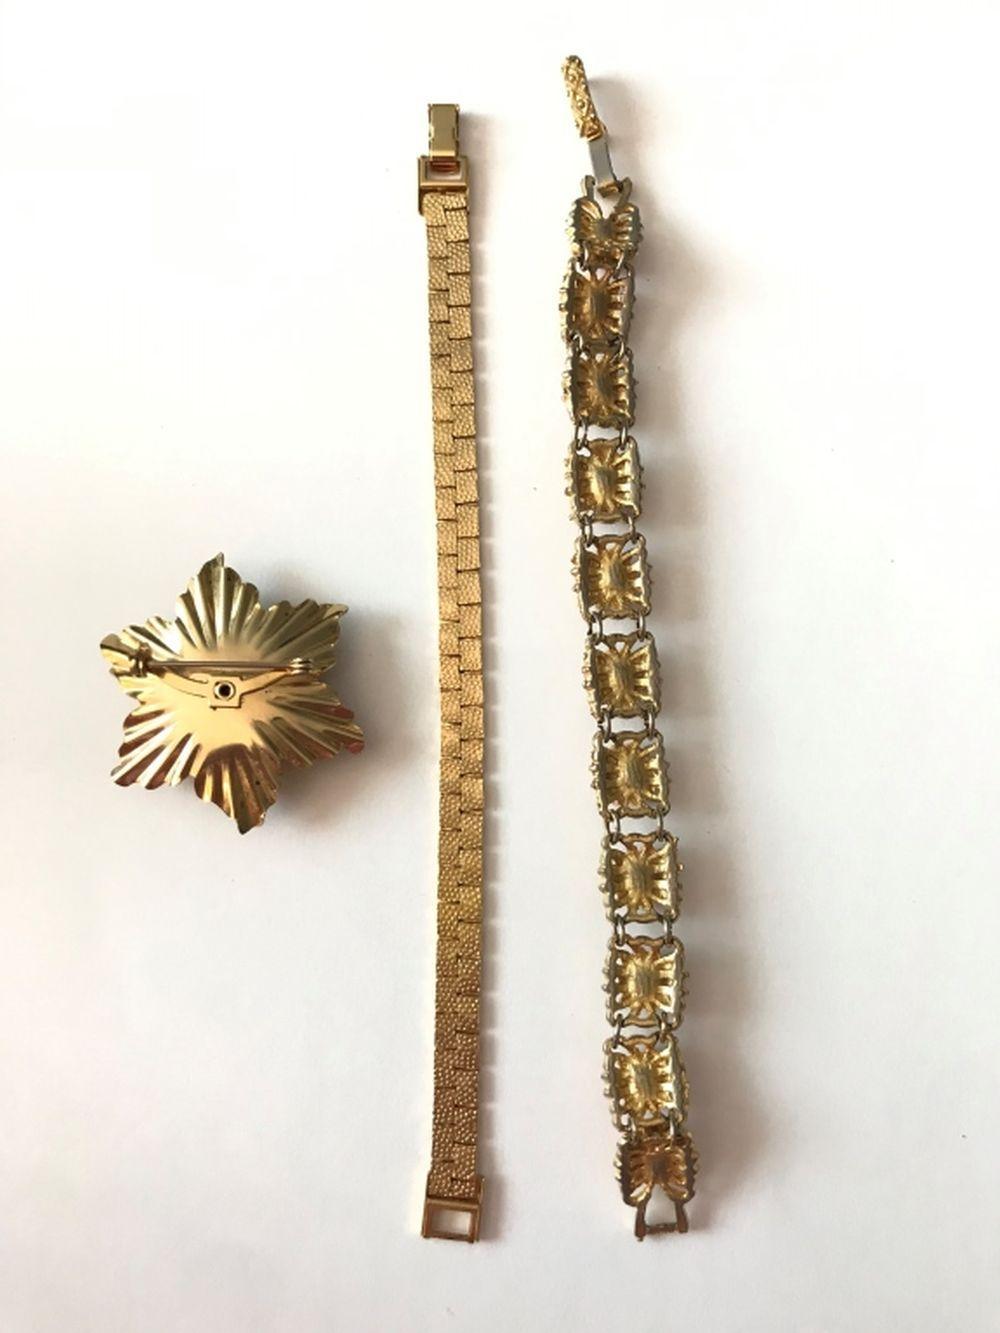 3 PIECE LOT GOLD TONE W/ PINK STONES/GEMS